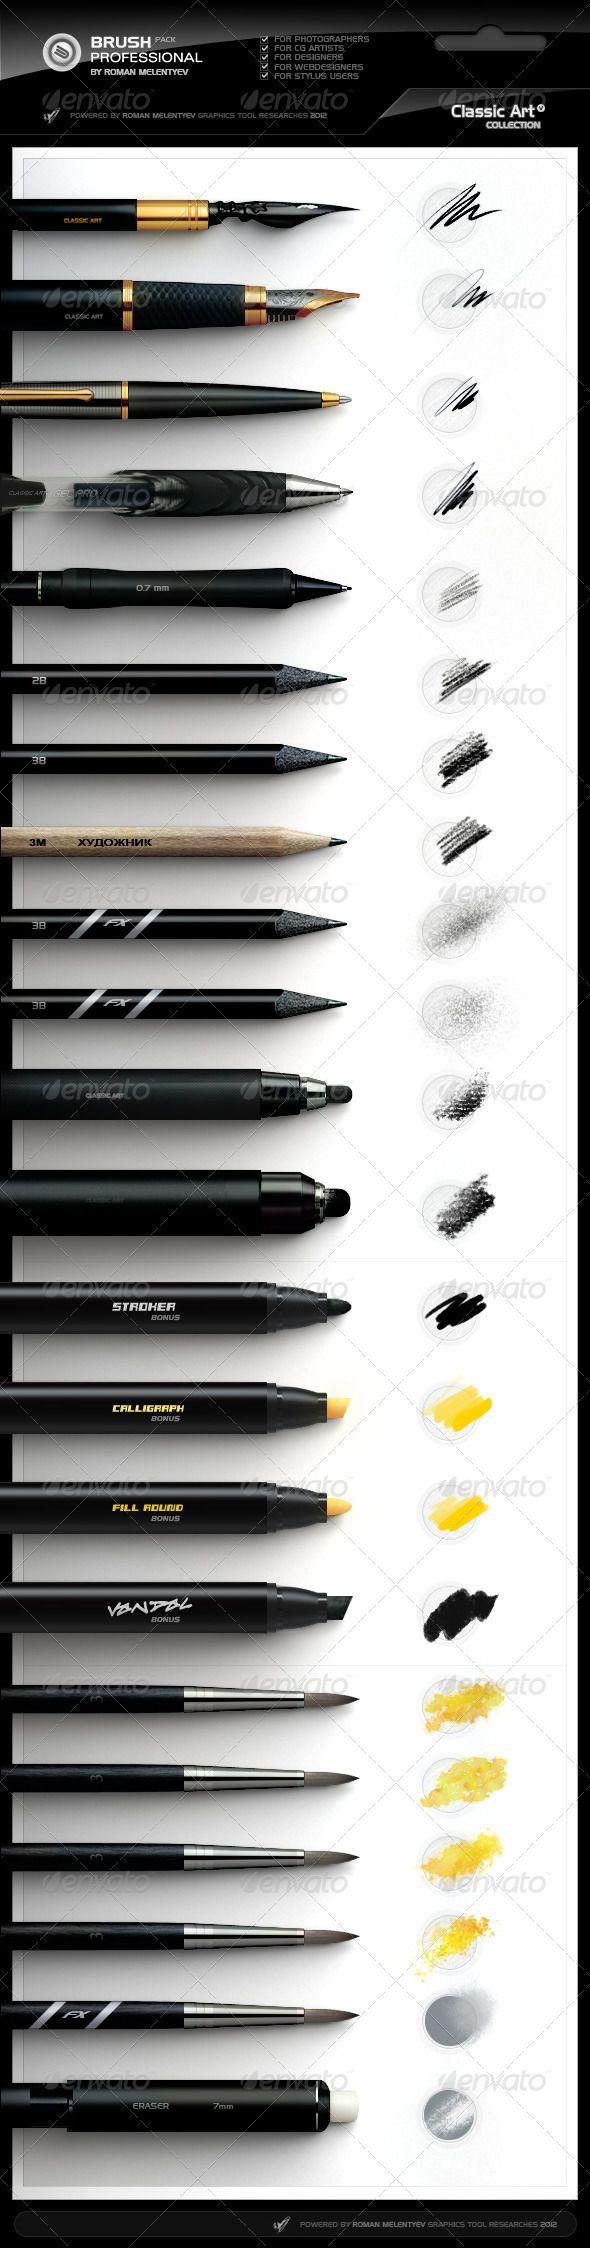 Photoshop Professional Brush Pack vol.4 - Classic Art